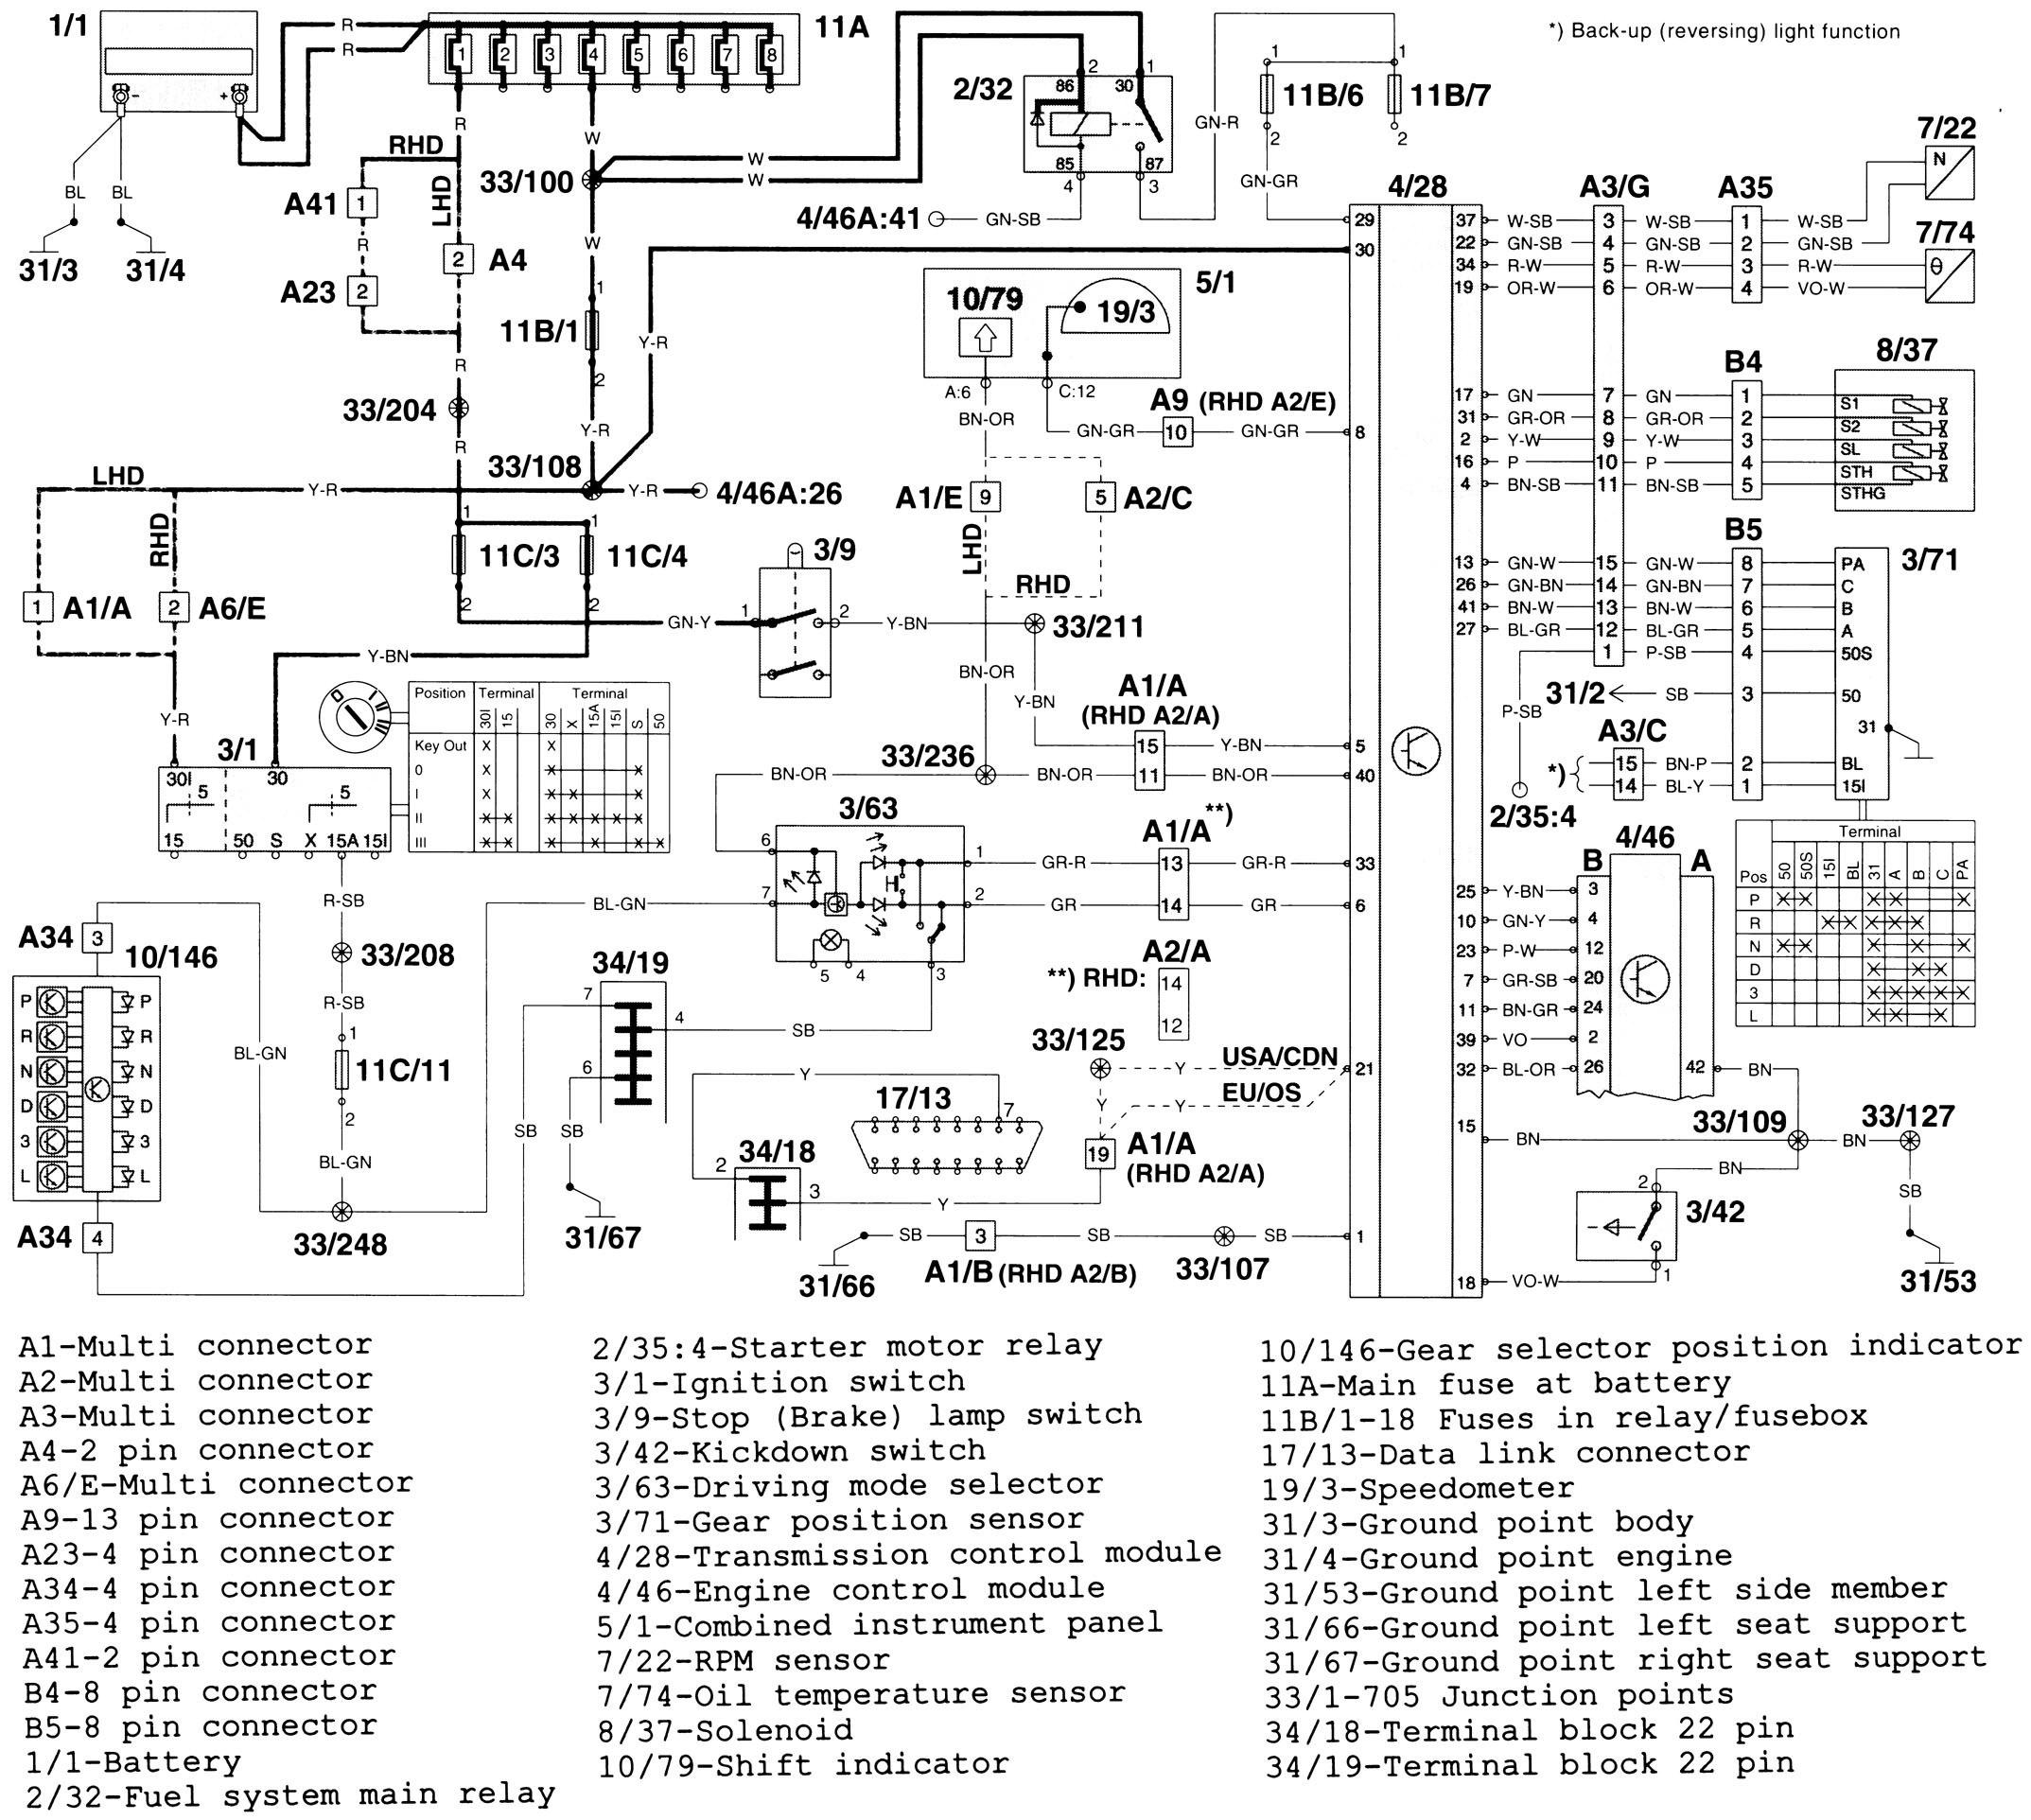 volvo v90 wiring diagram gearbox